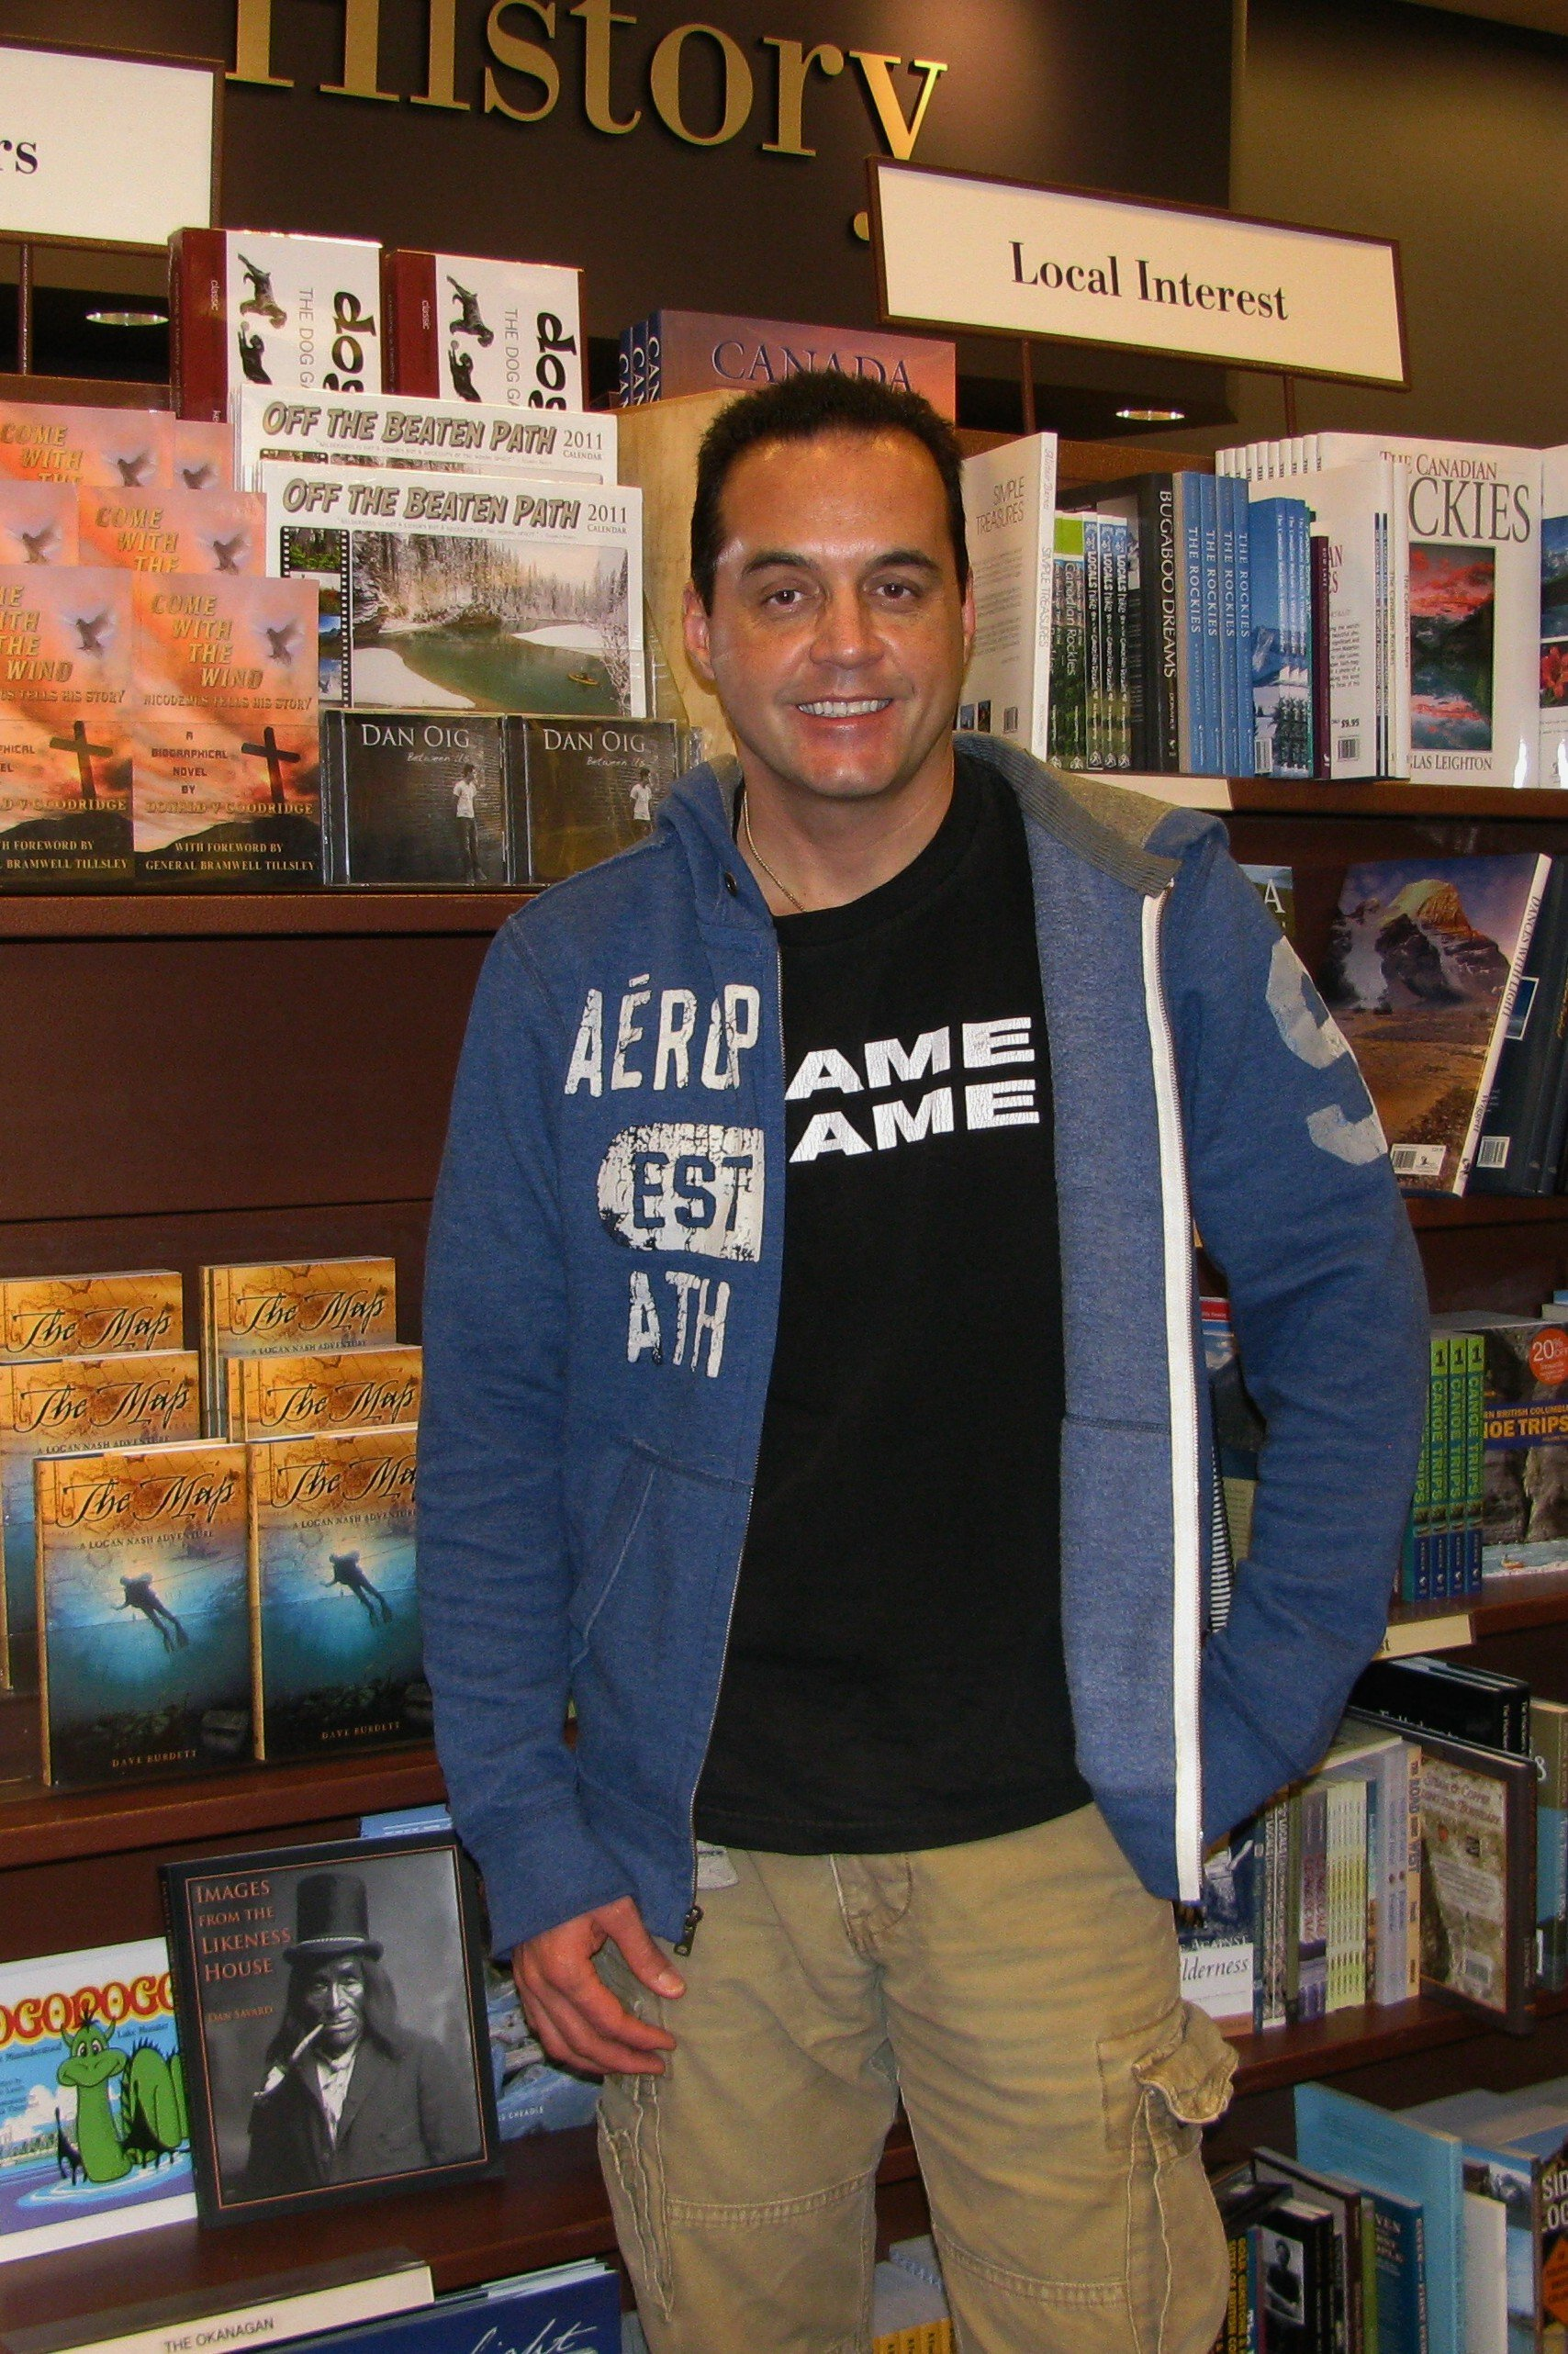 Dave Burdett, author of The Map, A Logan Nash Adventure, action/adventure novel series